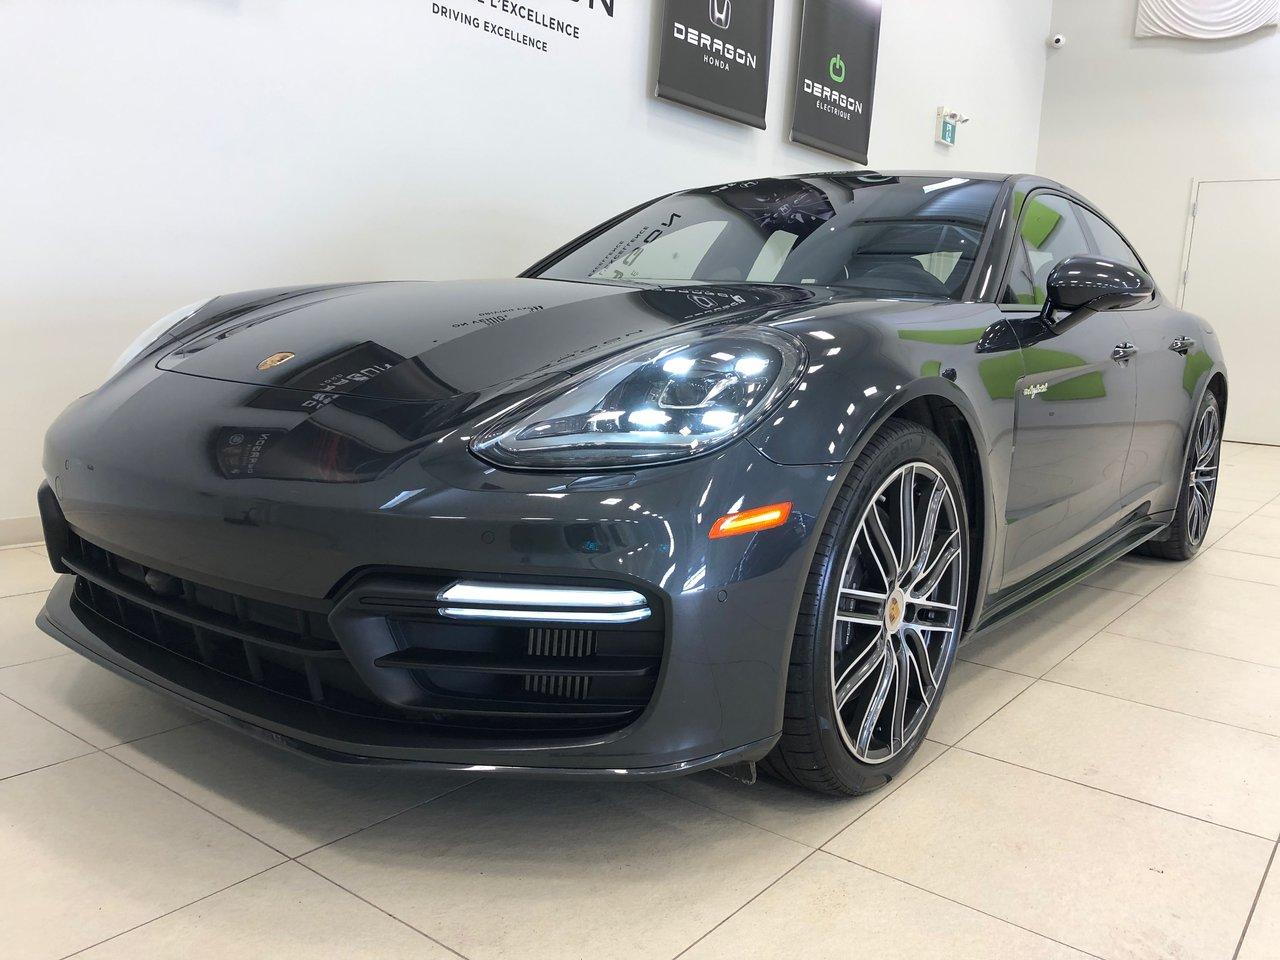 Porsche Panamera 2019 4 E-HYBRID, PREMIUM PACK, SPORTDESIGN PACK